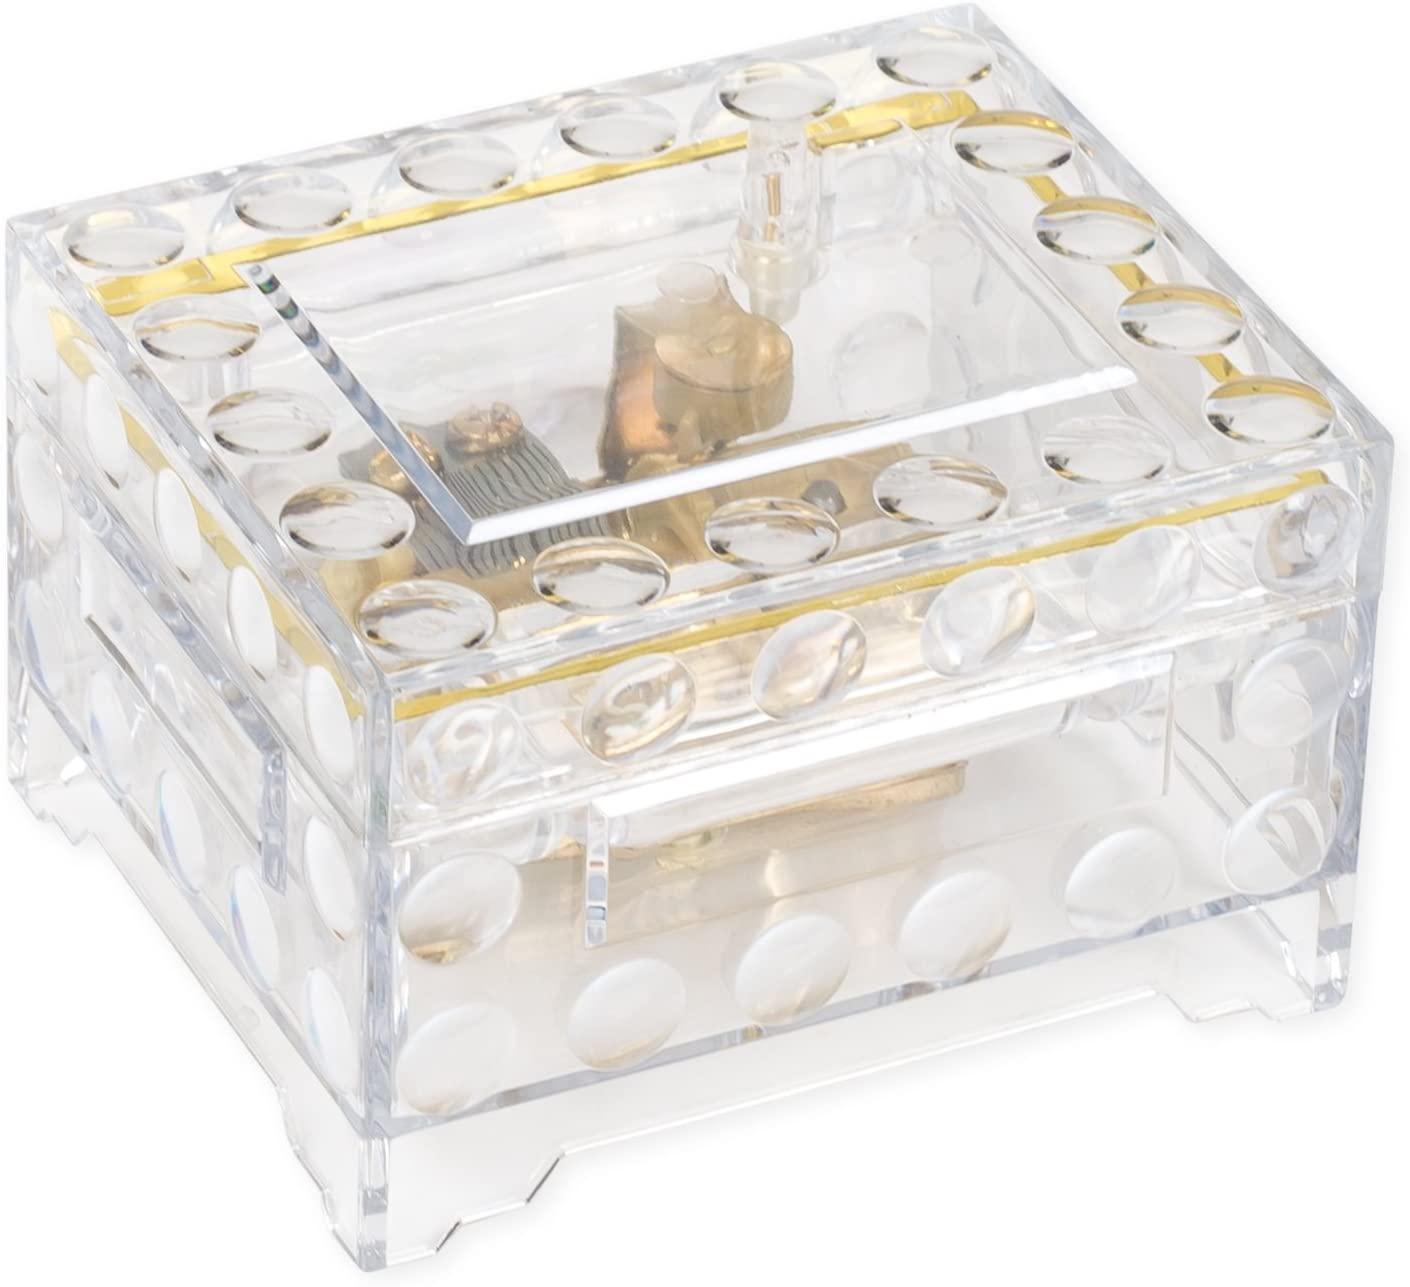 Clear Trunk Shaped Acrylic Musical Keepsake Box Plays Memory